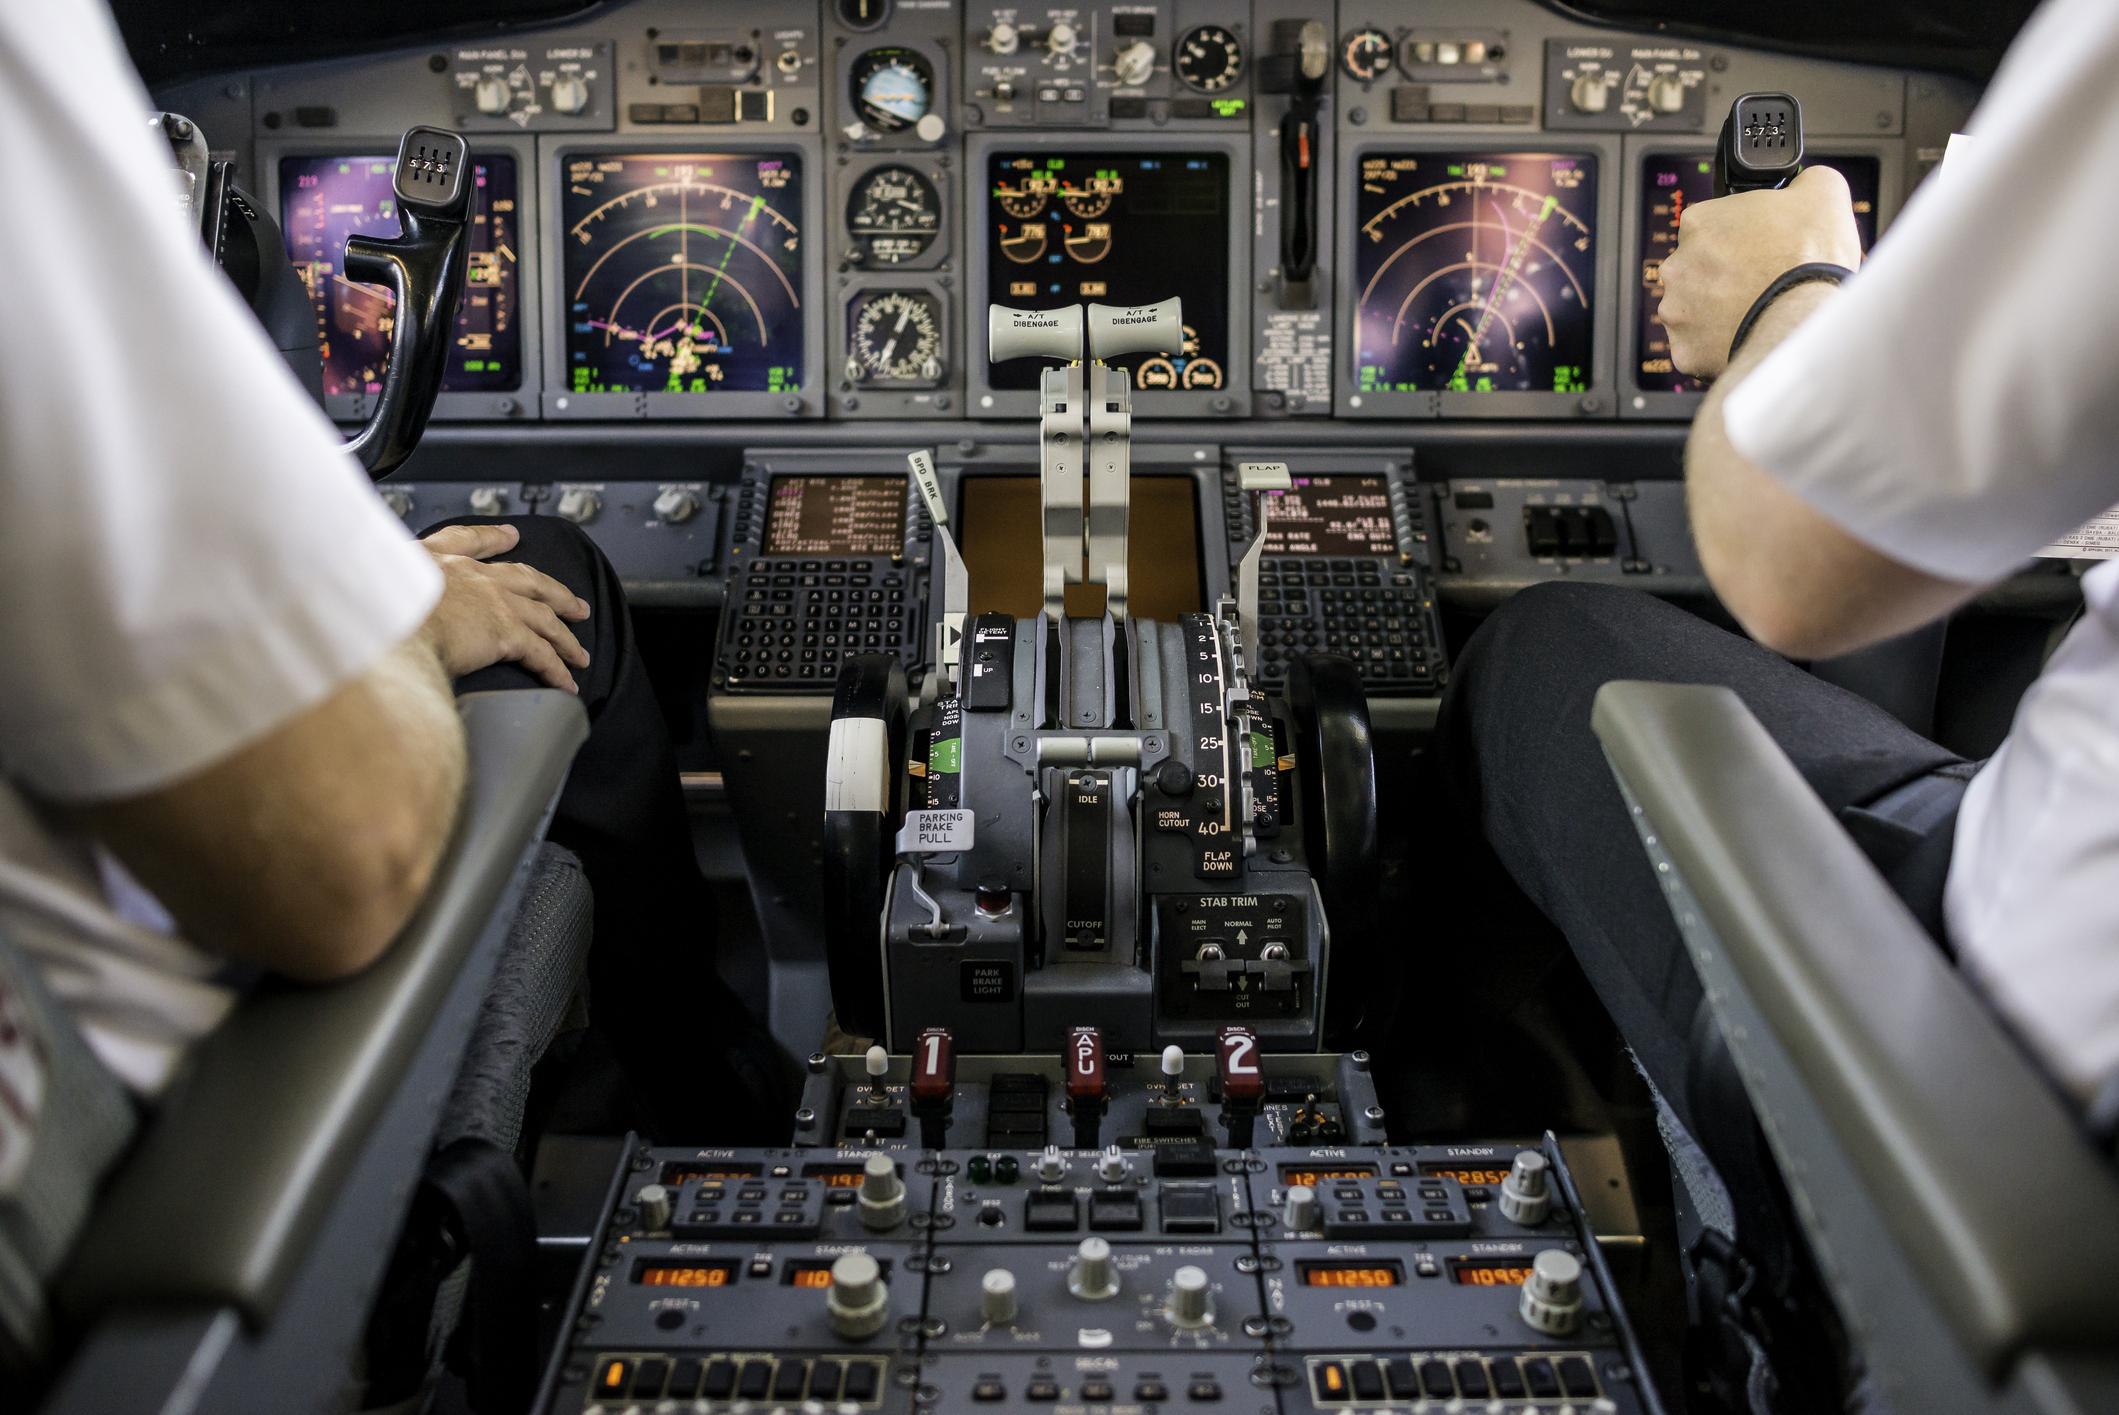 A Boeing 737 Cockpit.